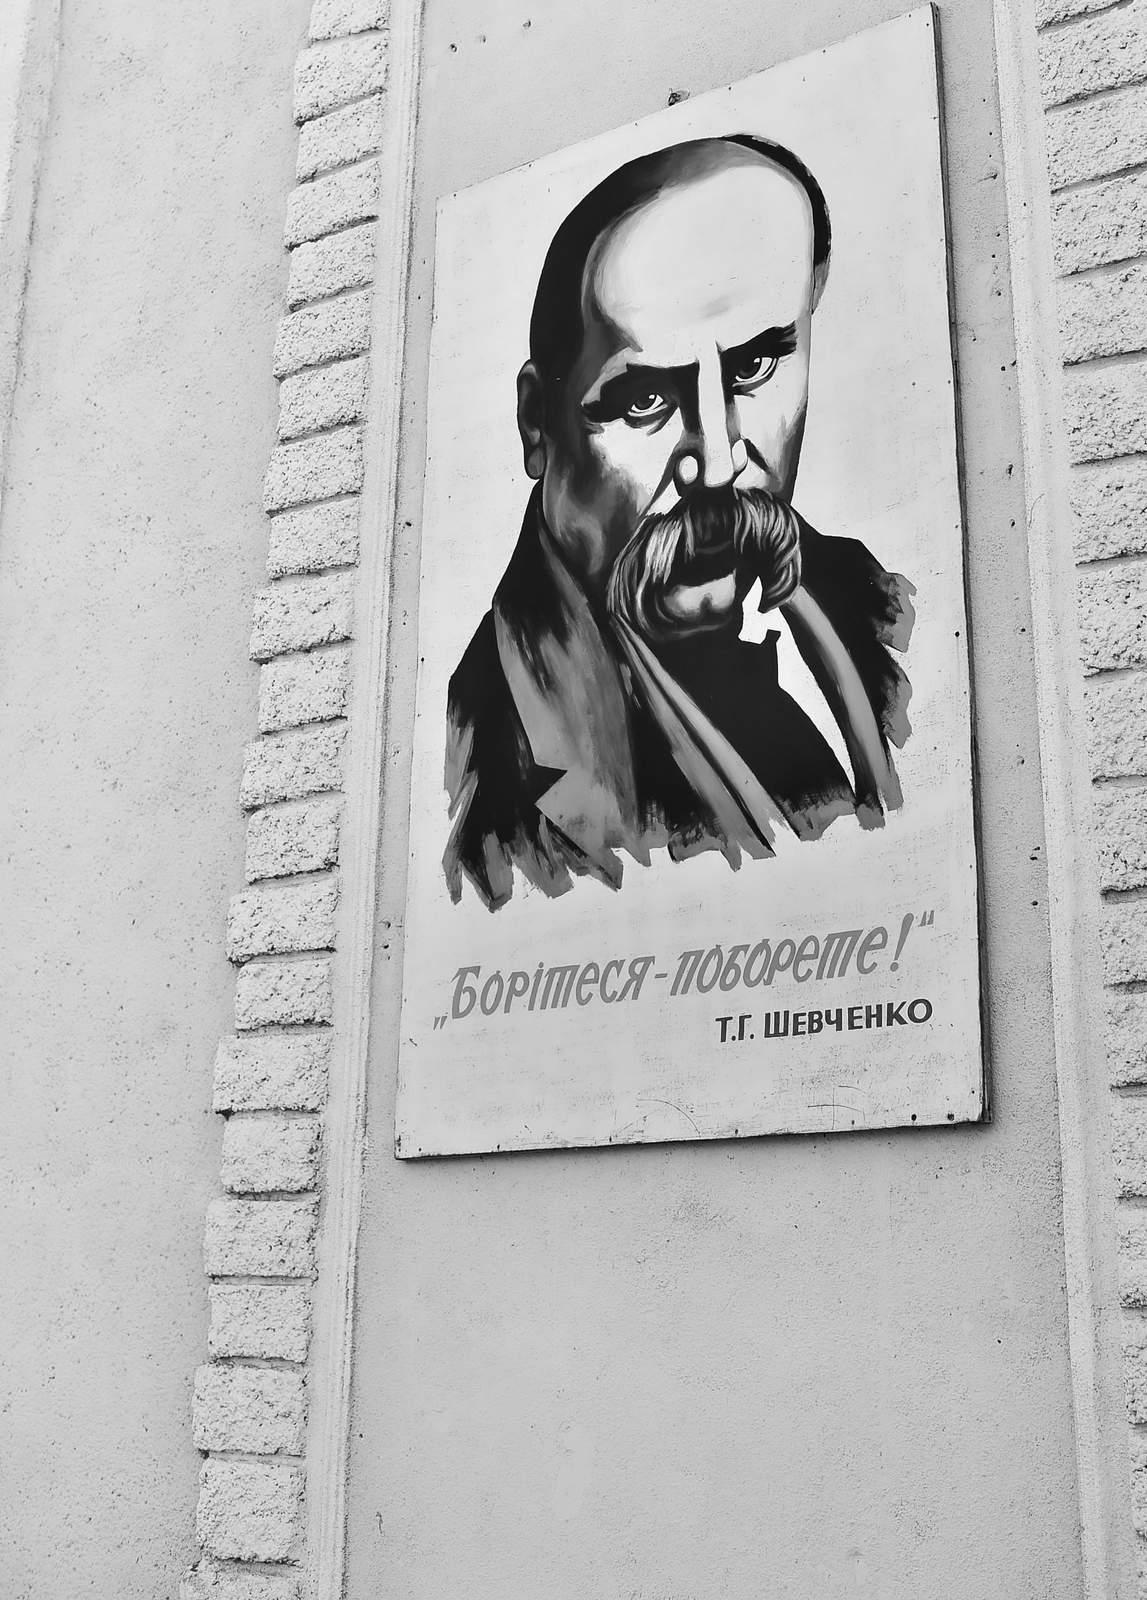 Founder of the Ukrainian Nation, Tchechenka